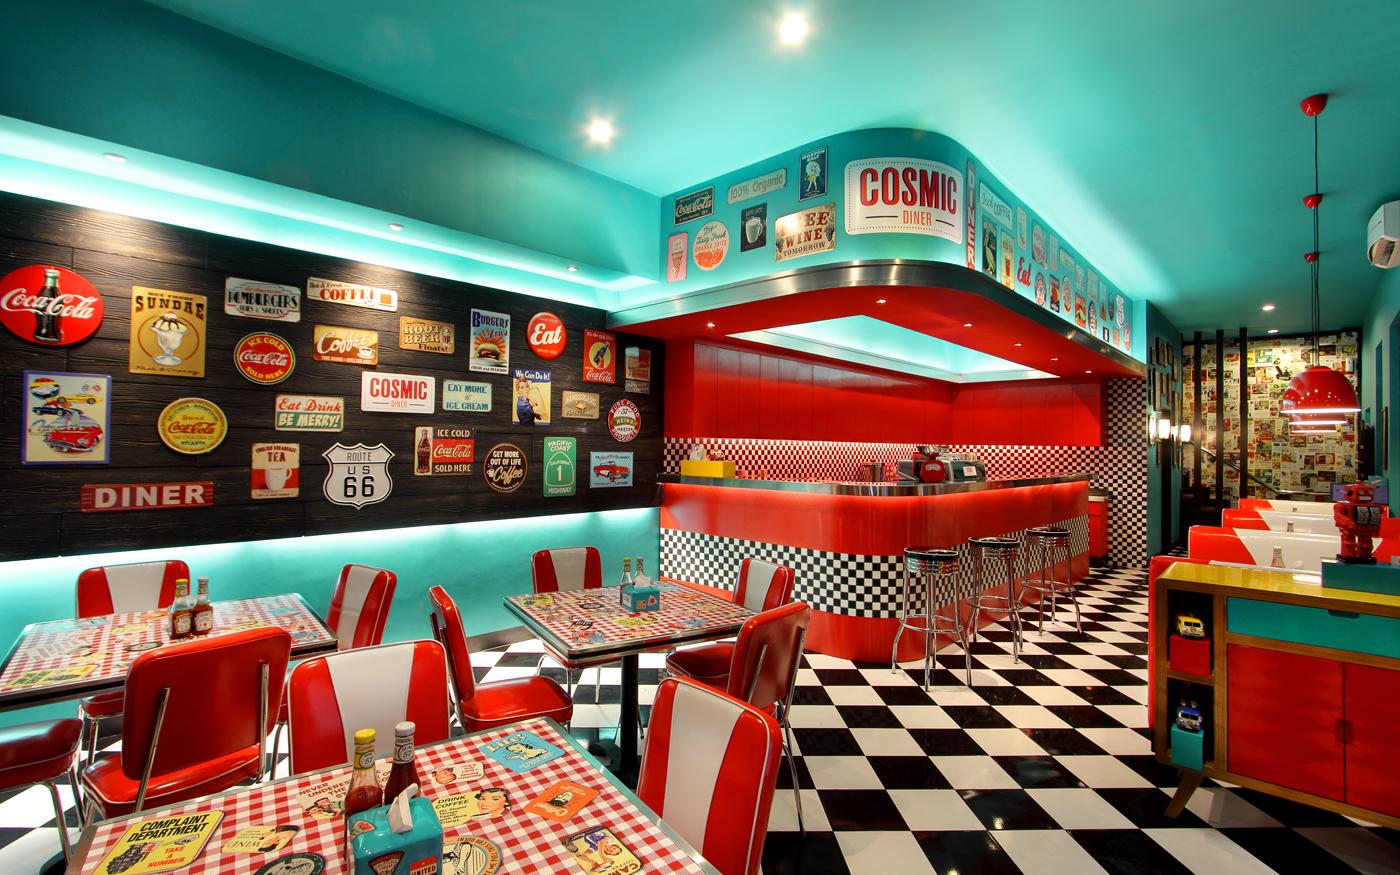 Tsid Cosmic Diner